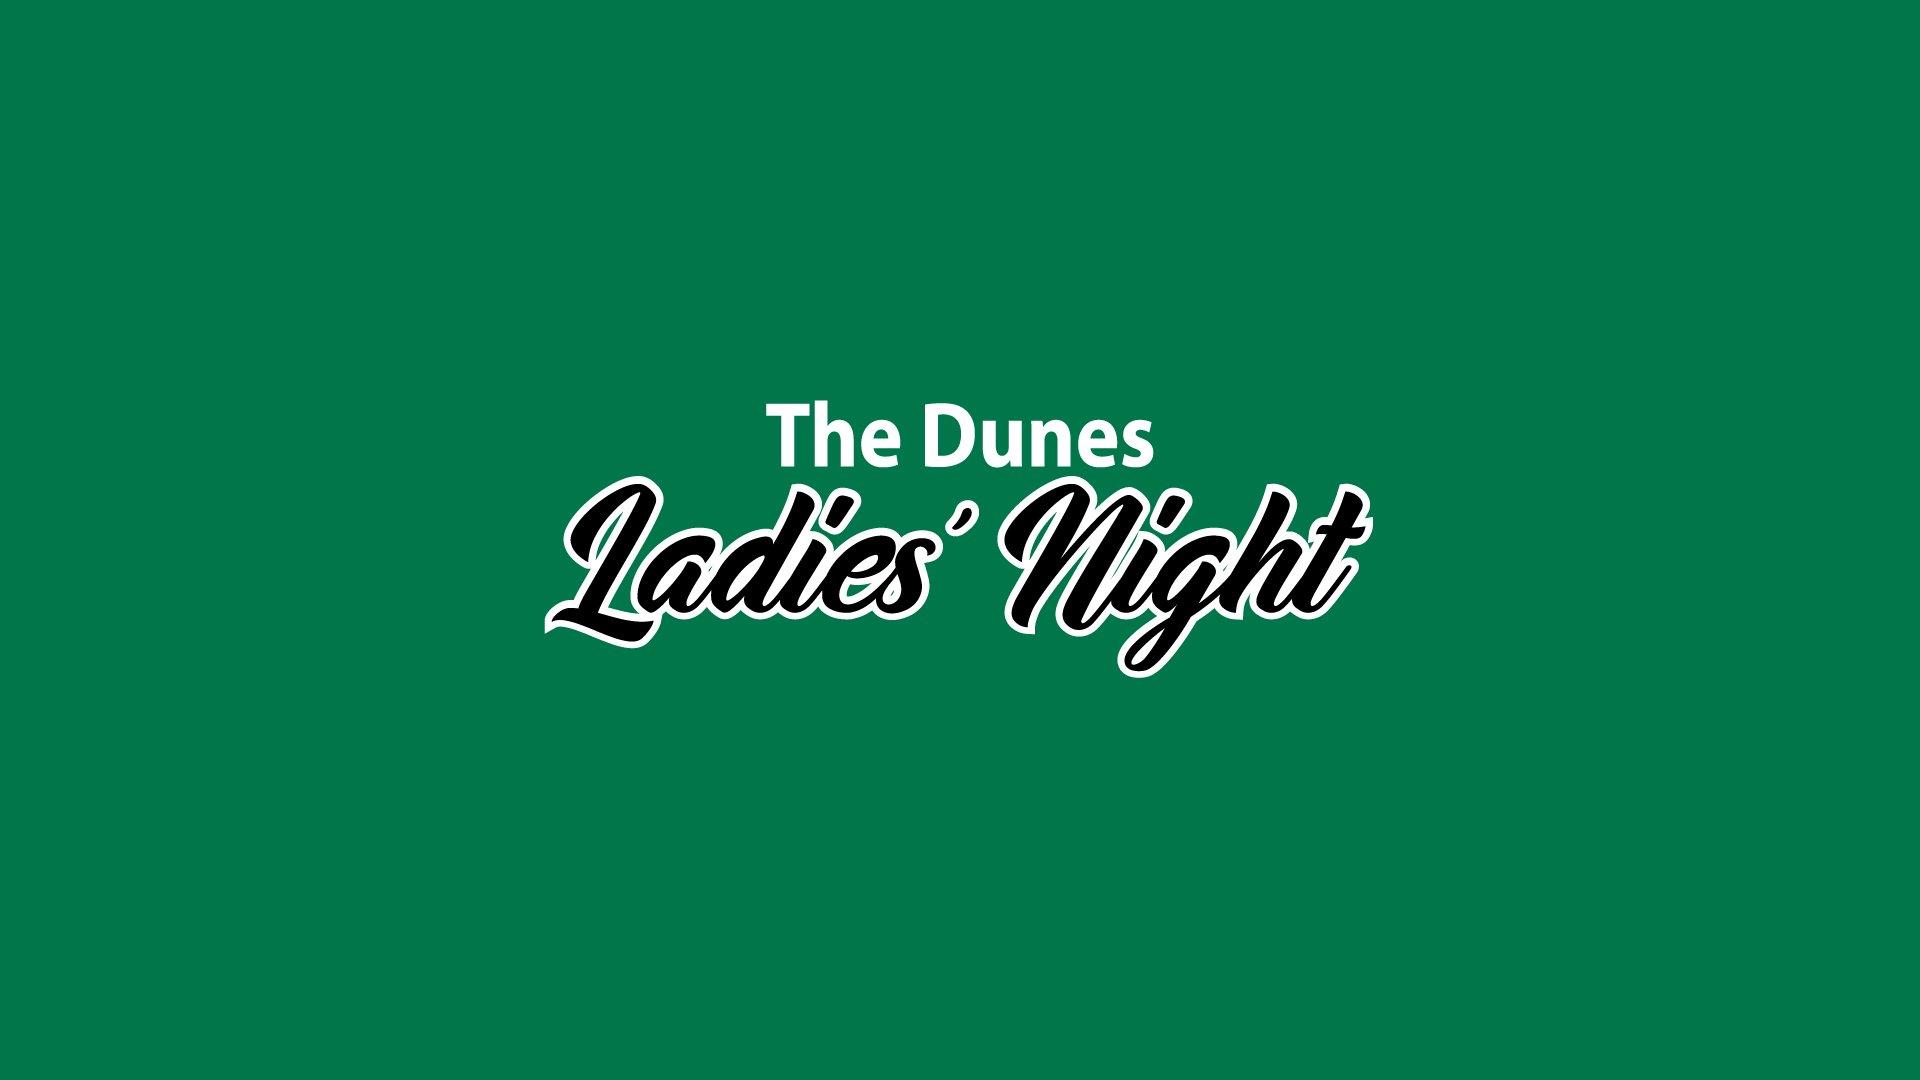 The Dunes Ladies Night Wednesday League